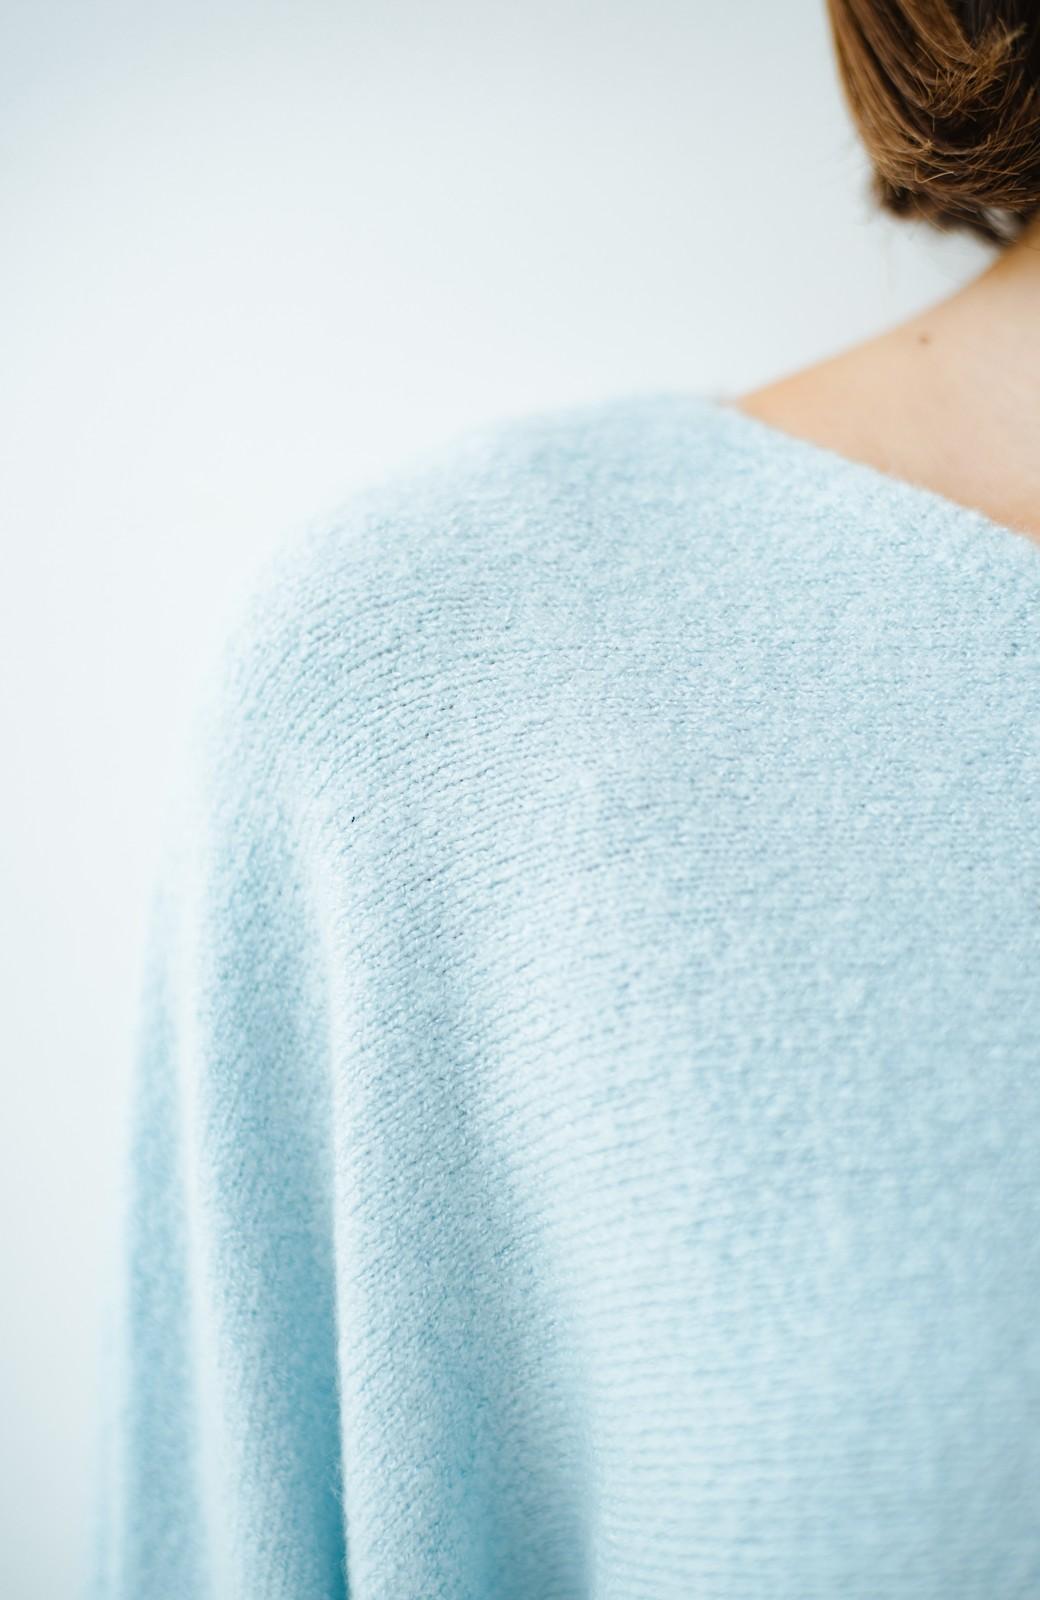 haco! 太め袖がかわいい横編みプルオーバーニット <ライトブルー>の商品写真4